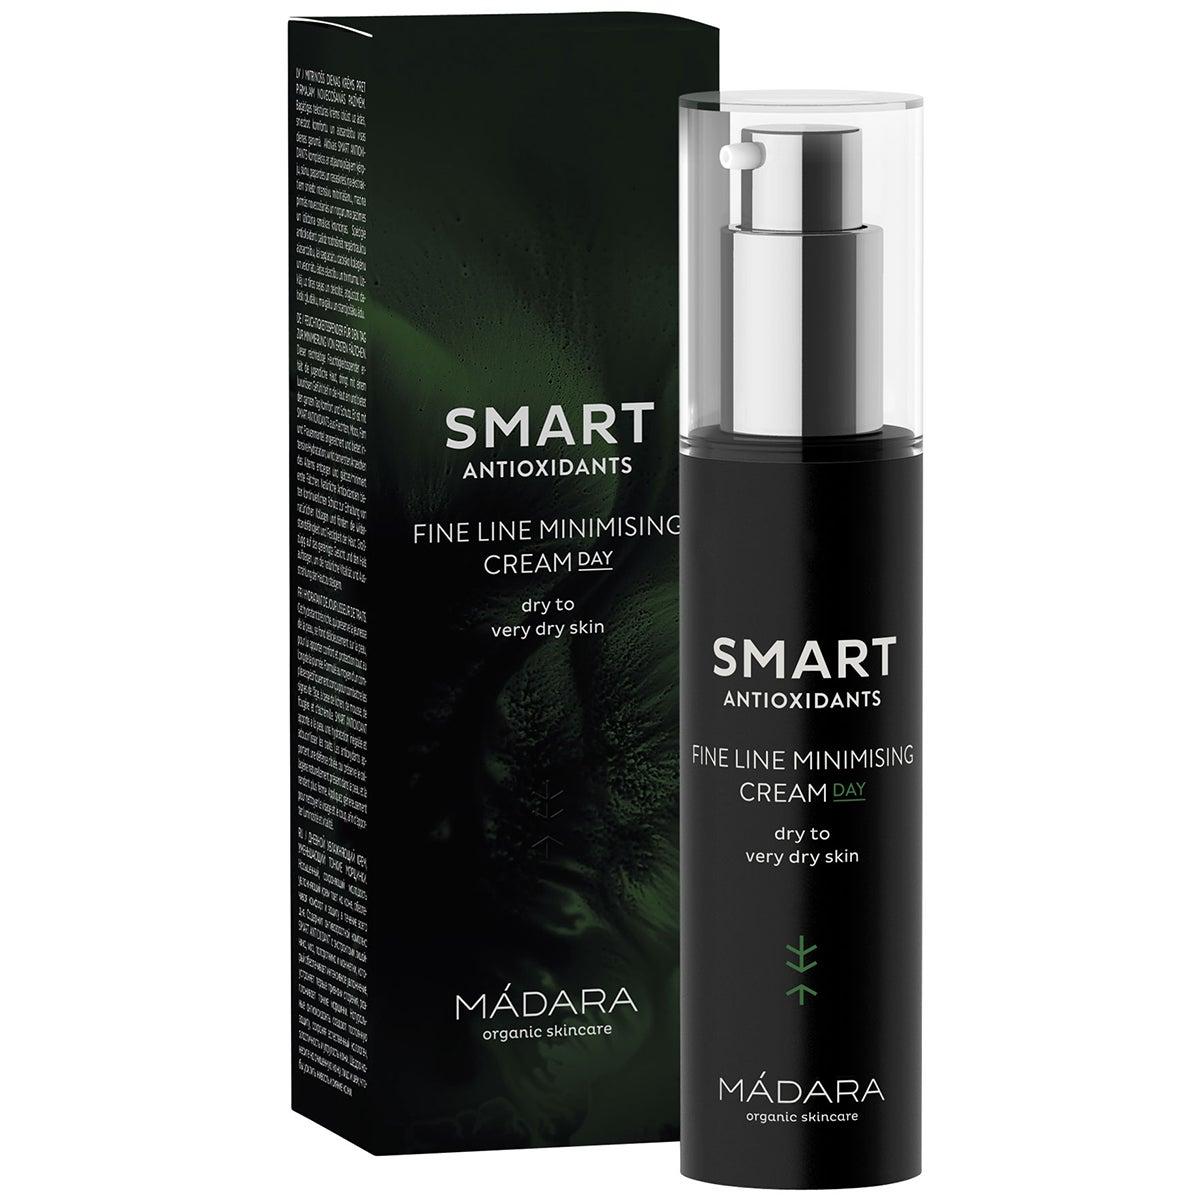 Smart Antioxidants Fine Line Minimizing Day Cream,  50 ml MÁDARA ecocosmetics Dagkräm